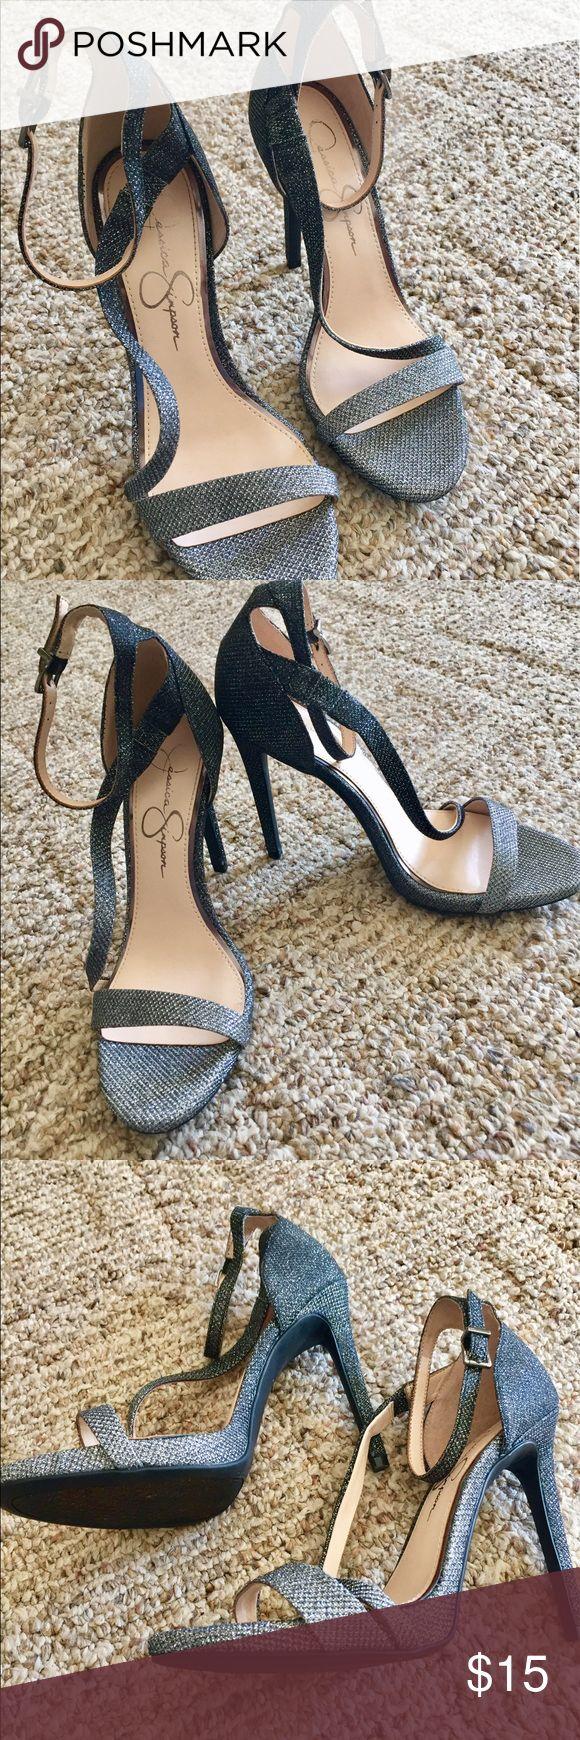 "Beautiful Jessica Simpson heels size8 m Beautiful high heels By Jessica Simpson in sparkly grey. High heels about 5"" size 8 Jessica Simpson Shoes"